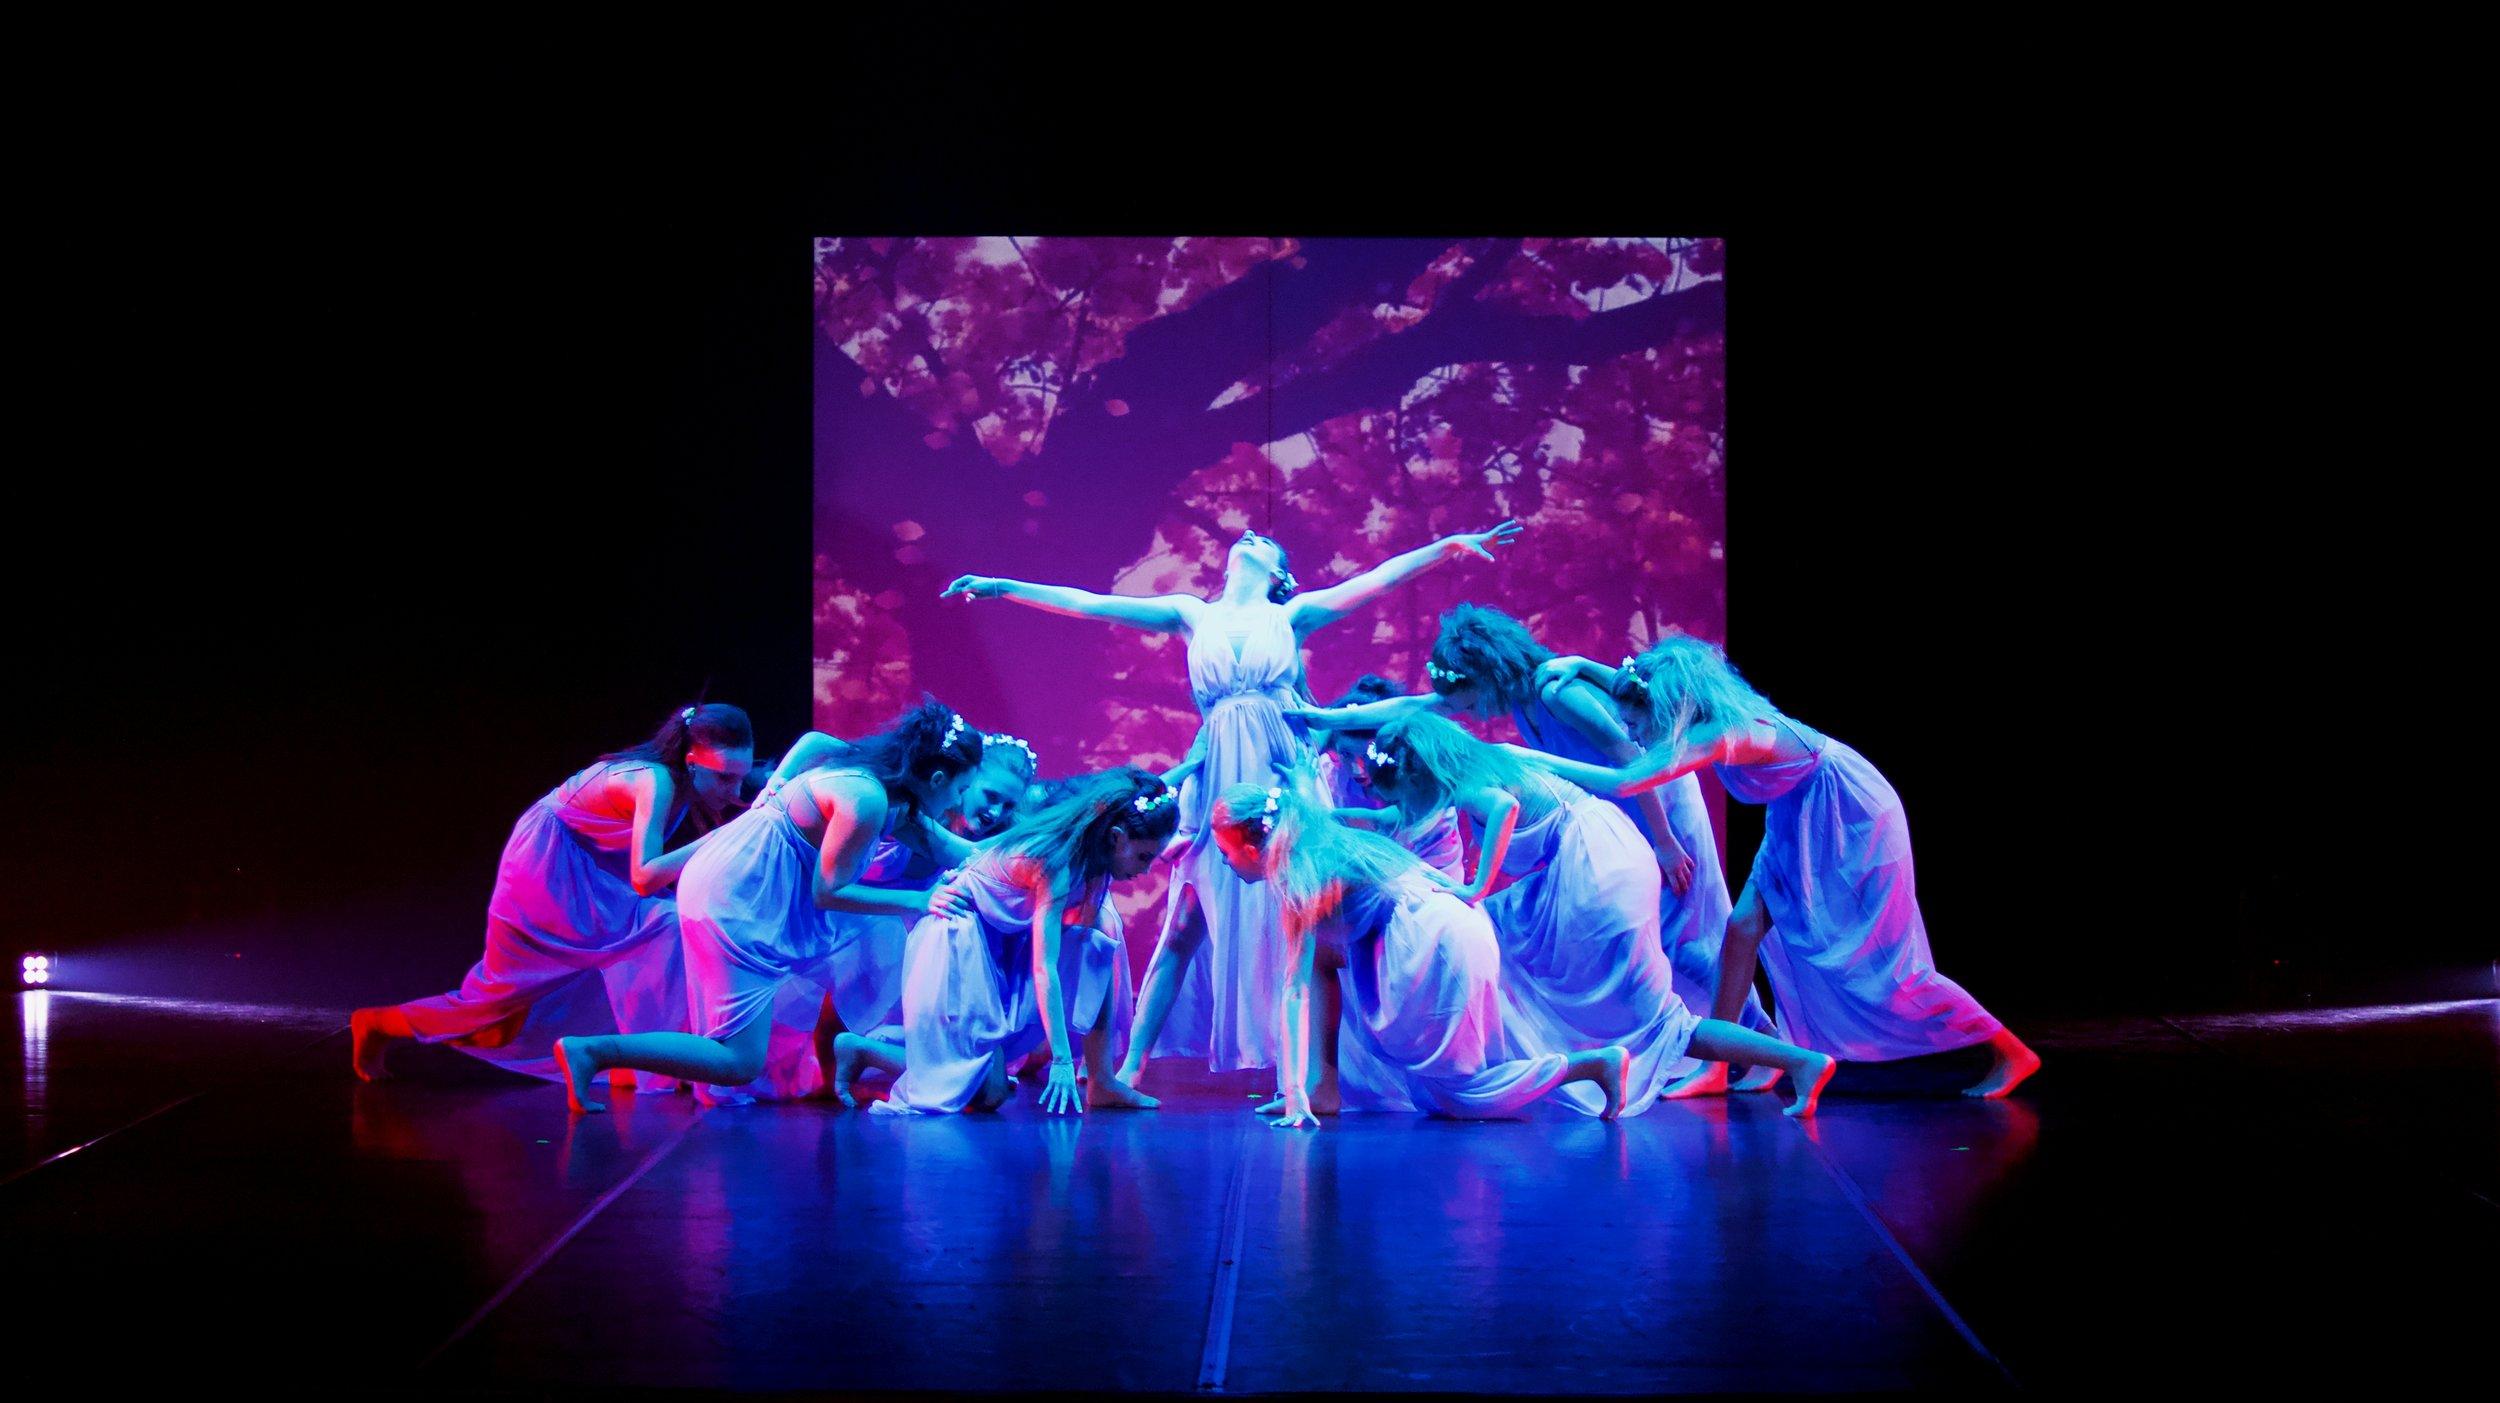 pensieri sentimenti movimenti danza - jAZZ DANCE, HIP HOP, VIDEO DANCE, VIDEO DANCE SUI TACCHI, DANZA CLASSICA, BROADWAY DANCE, LYRICAL JAZZ, PRE DANCE, JAZZ TECNICO A PARTIRE DAI 4 ANNI